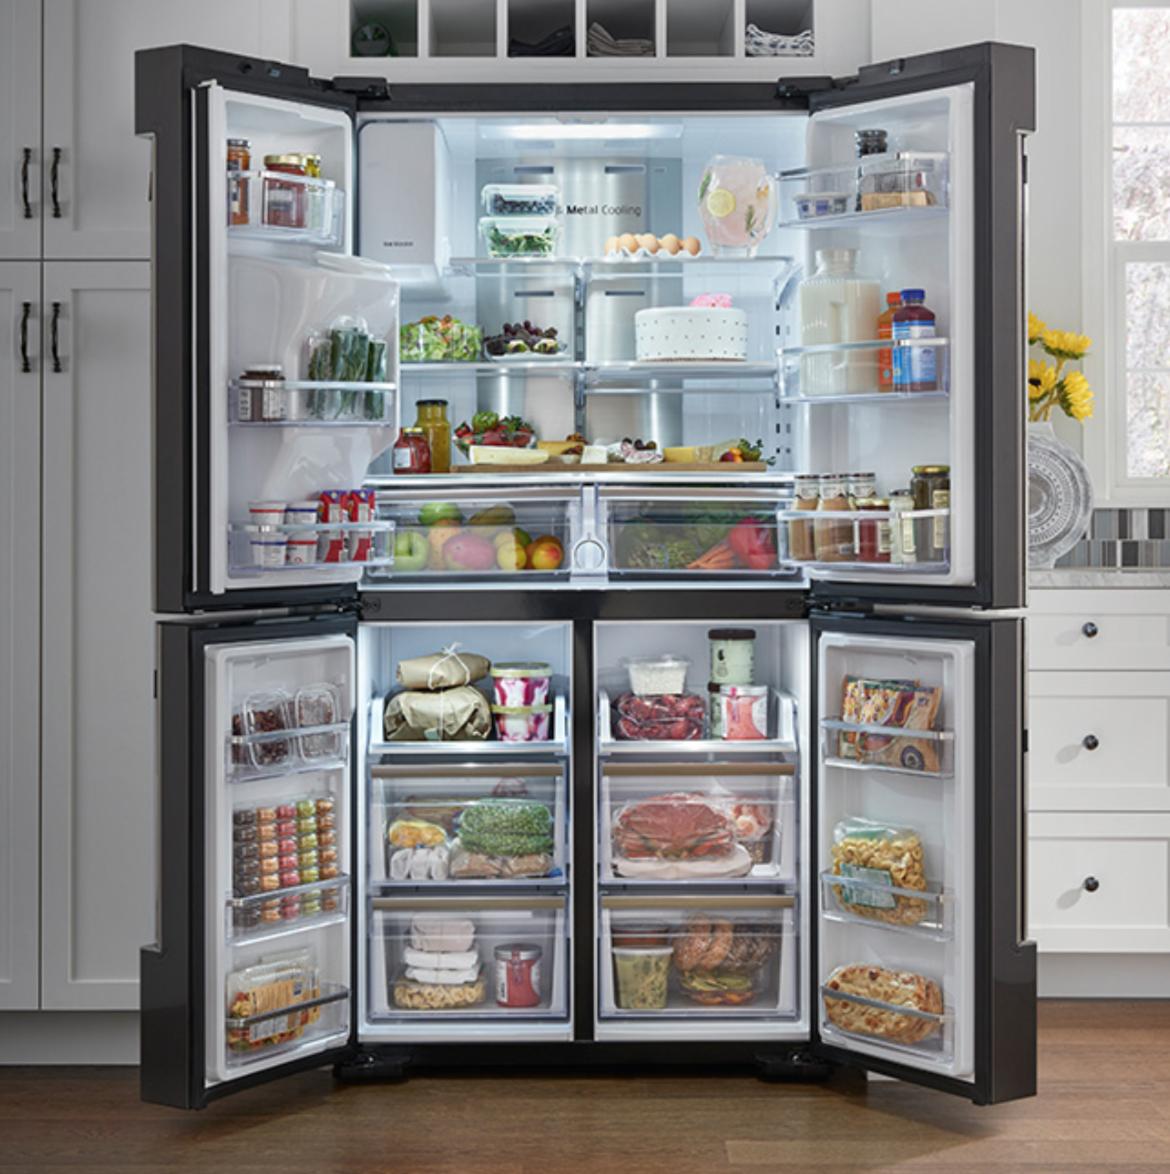 Samsung fridge interior.png